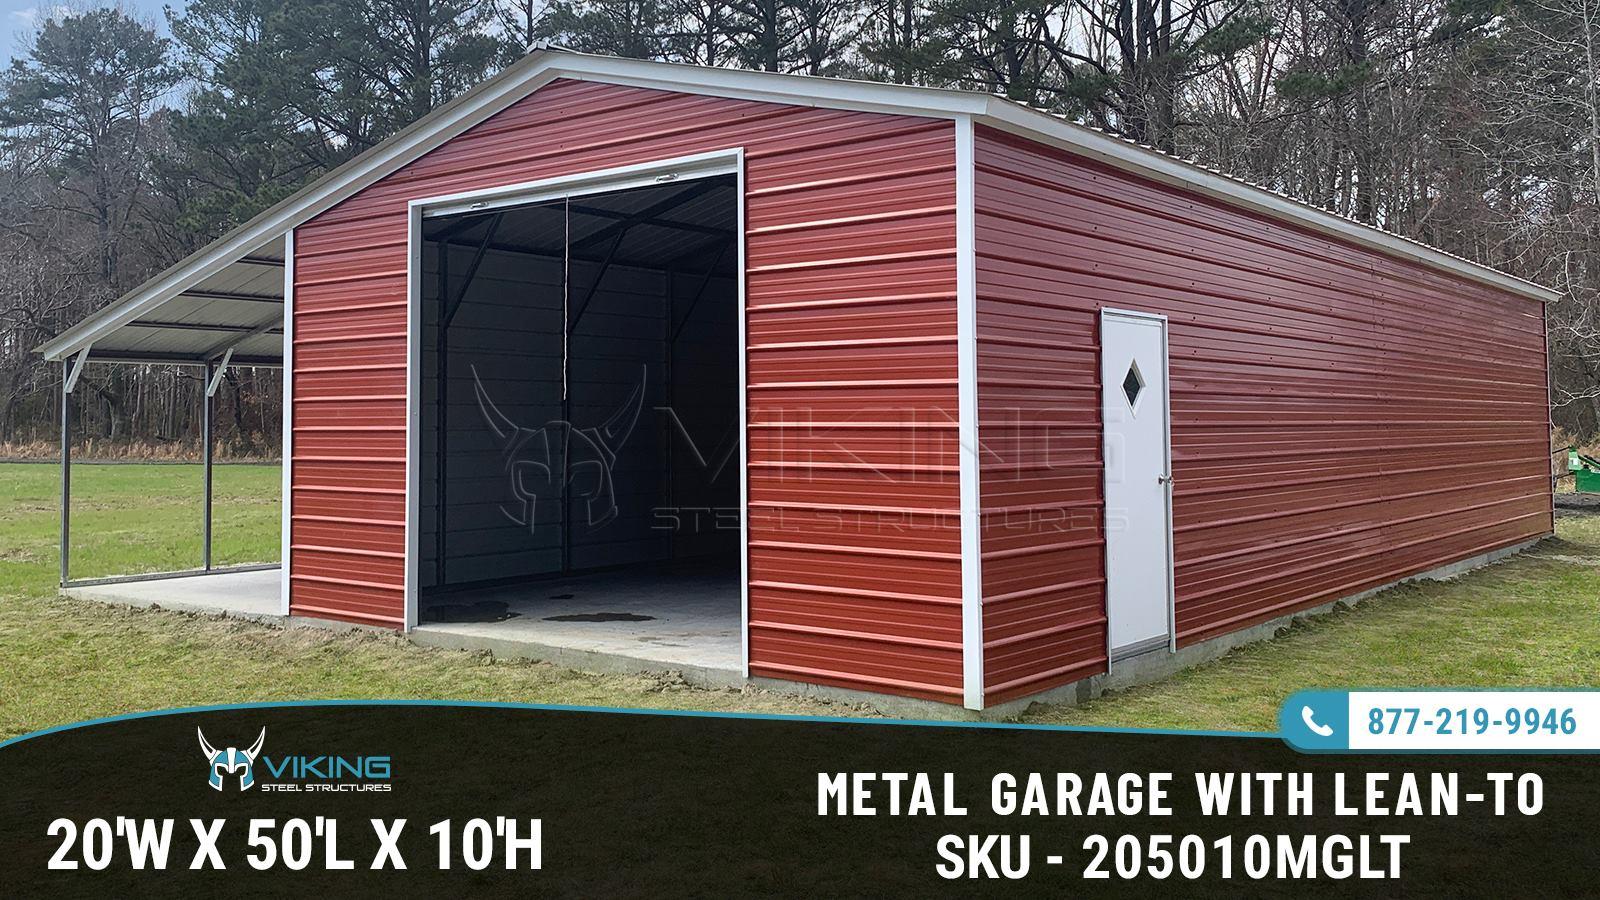 20x50x10-metal-garage-with-leanto